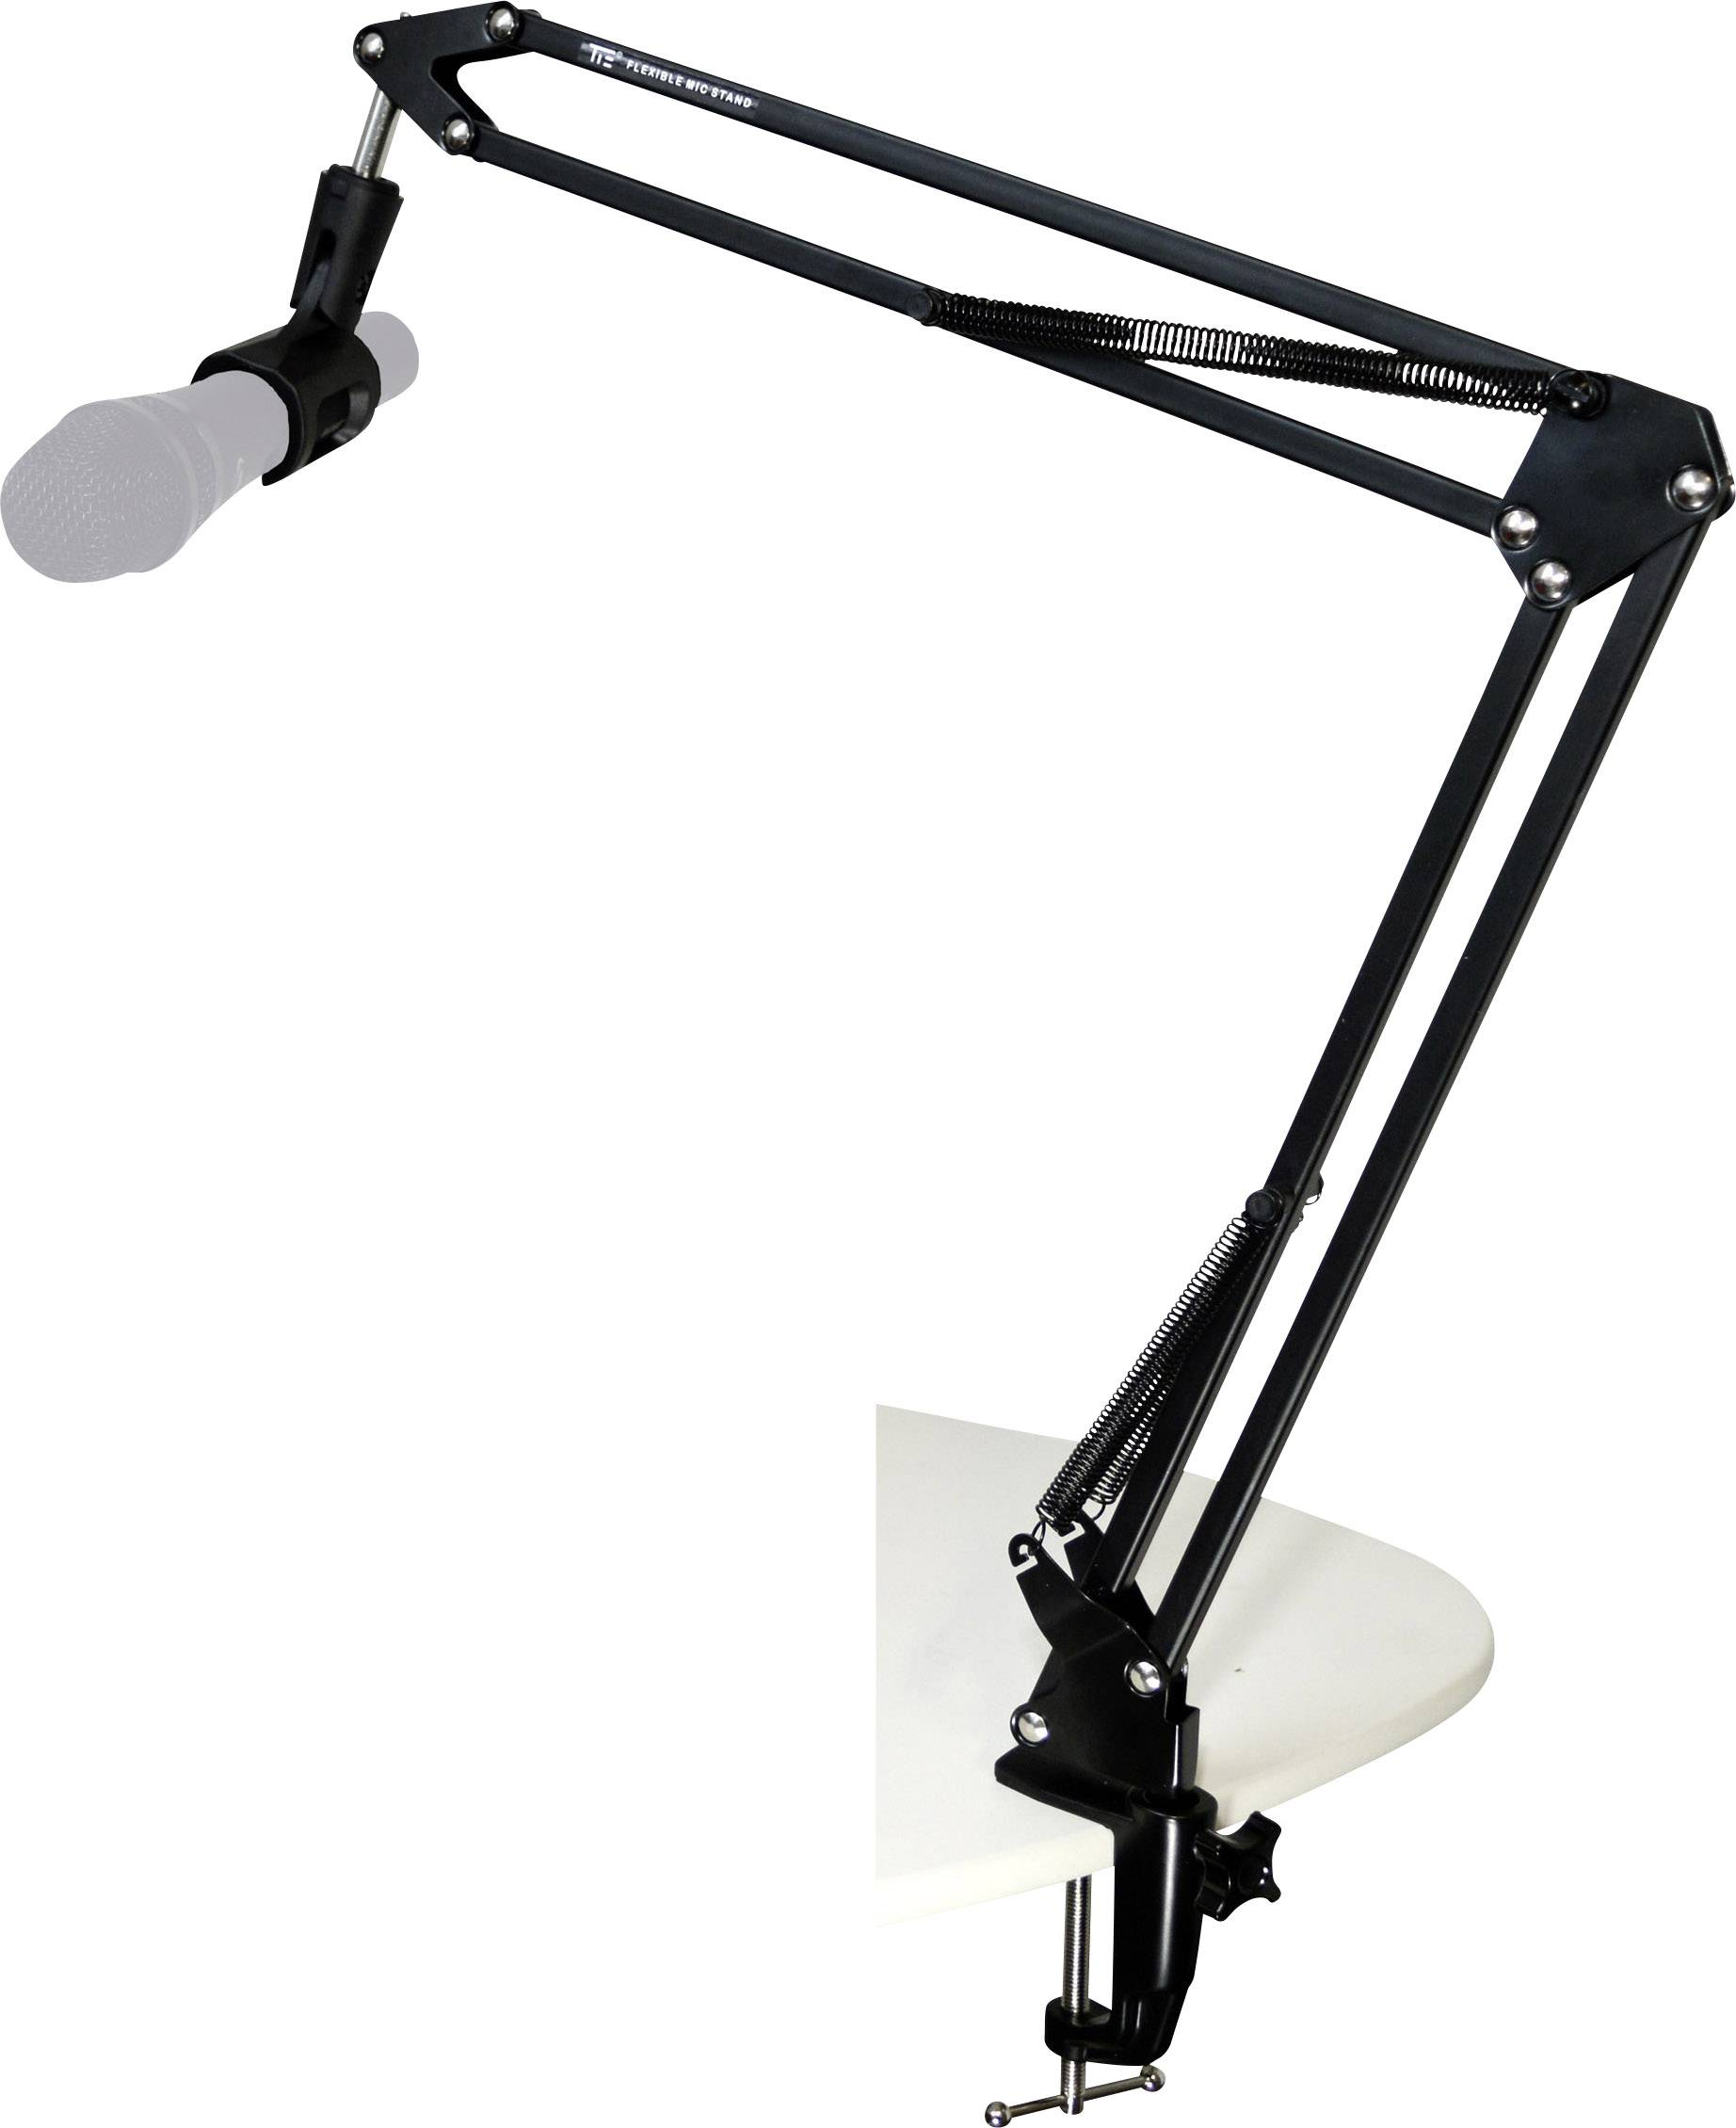 Flexibilní rameno pro mikrofon Tie Studio, 75 cm